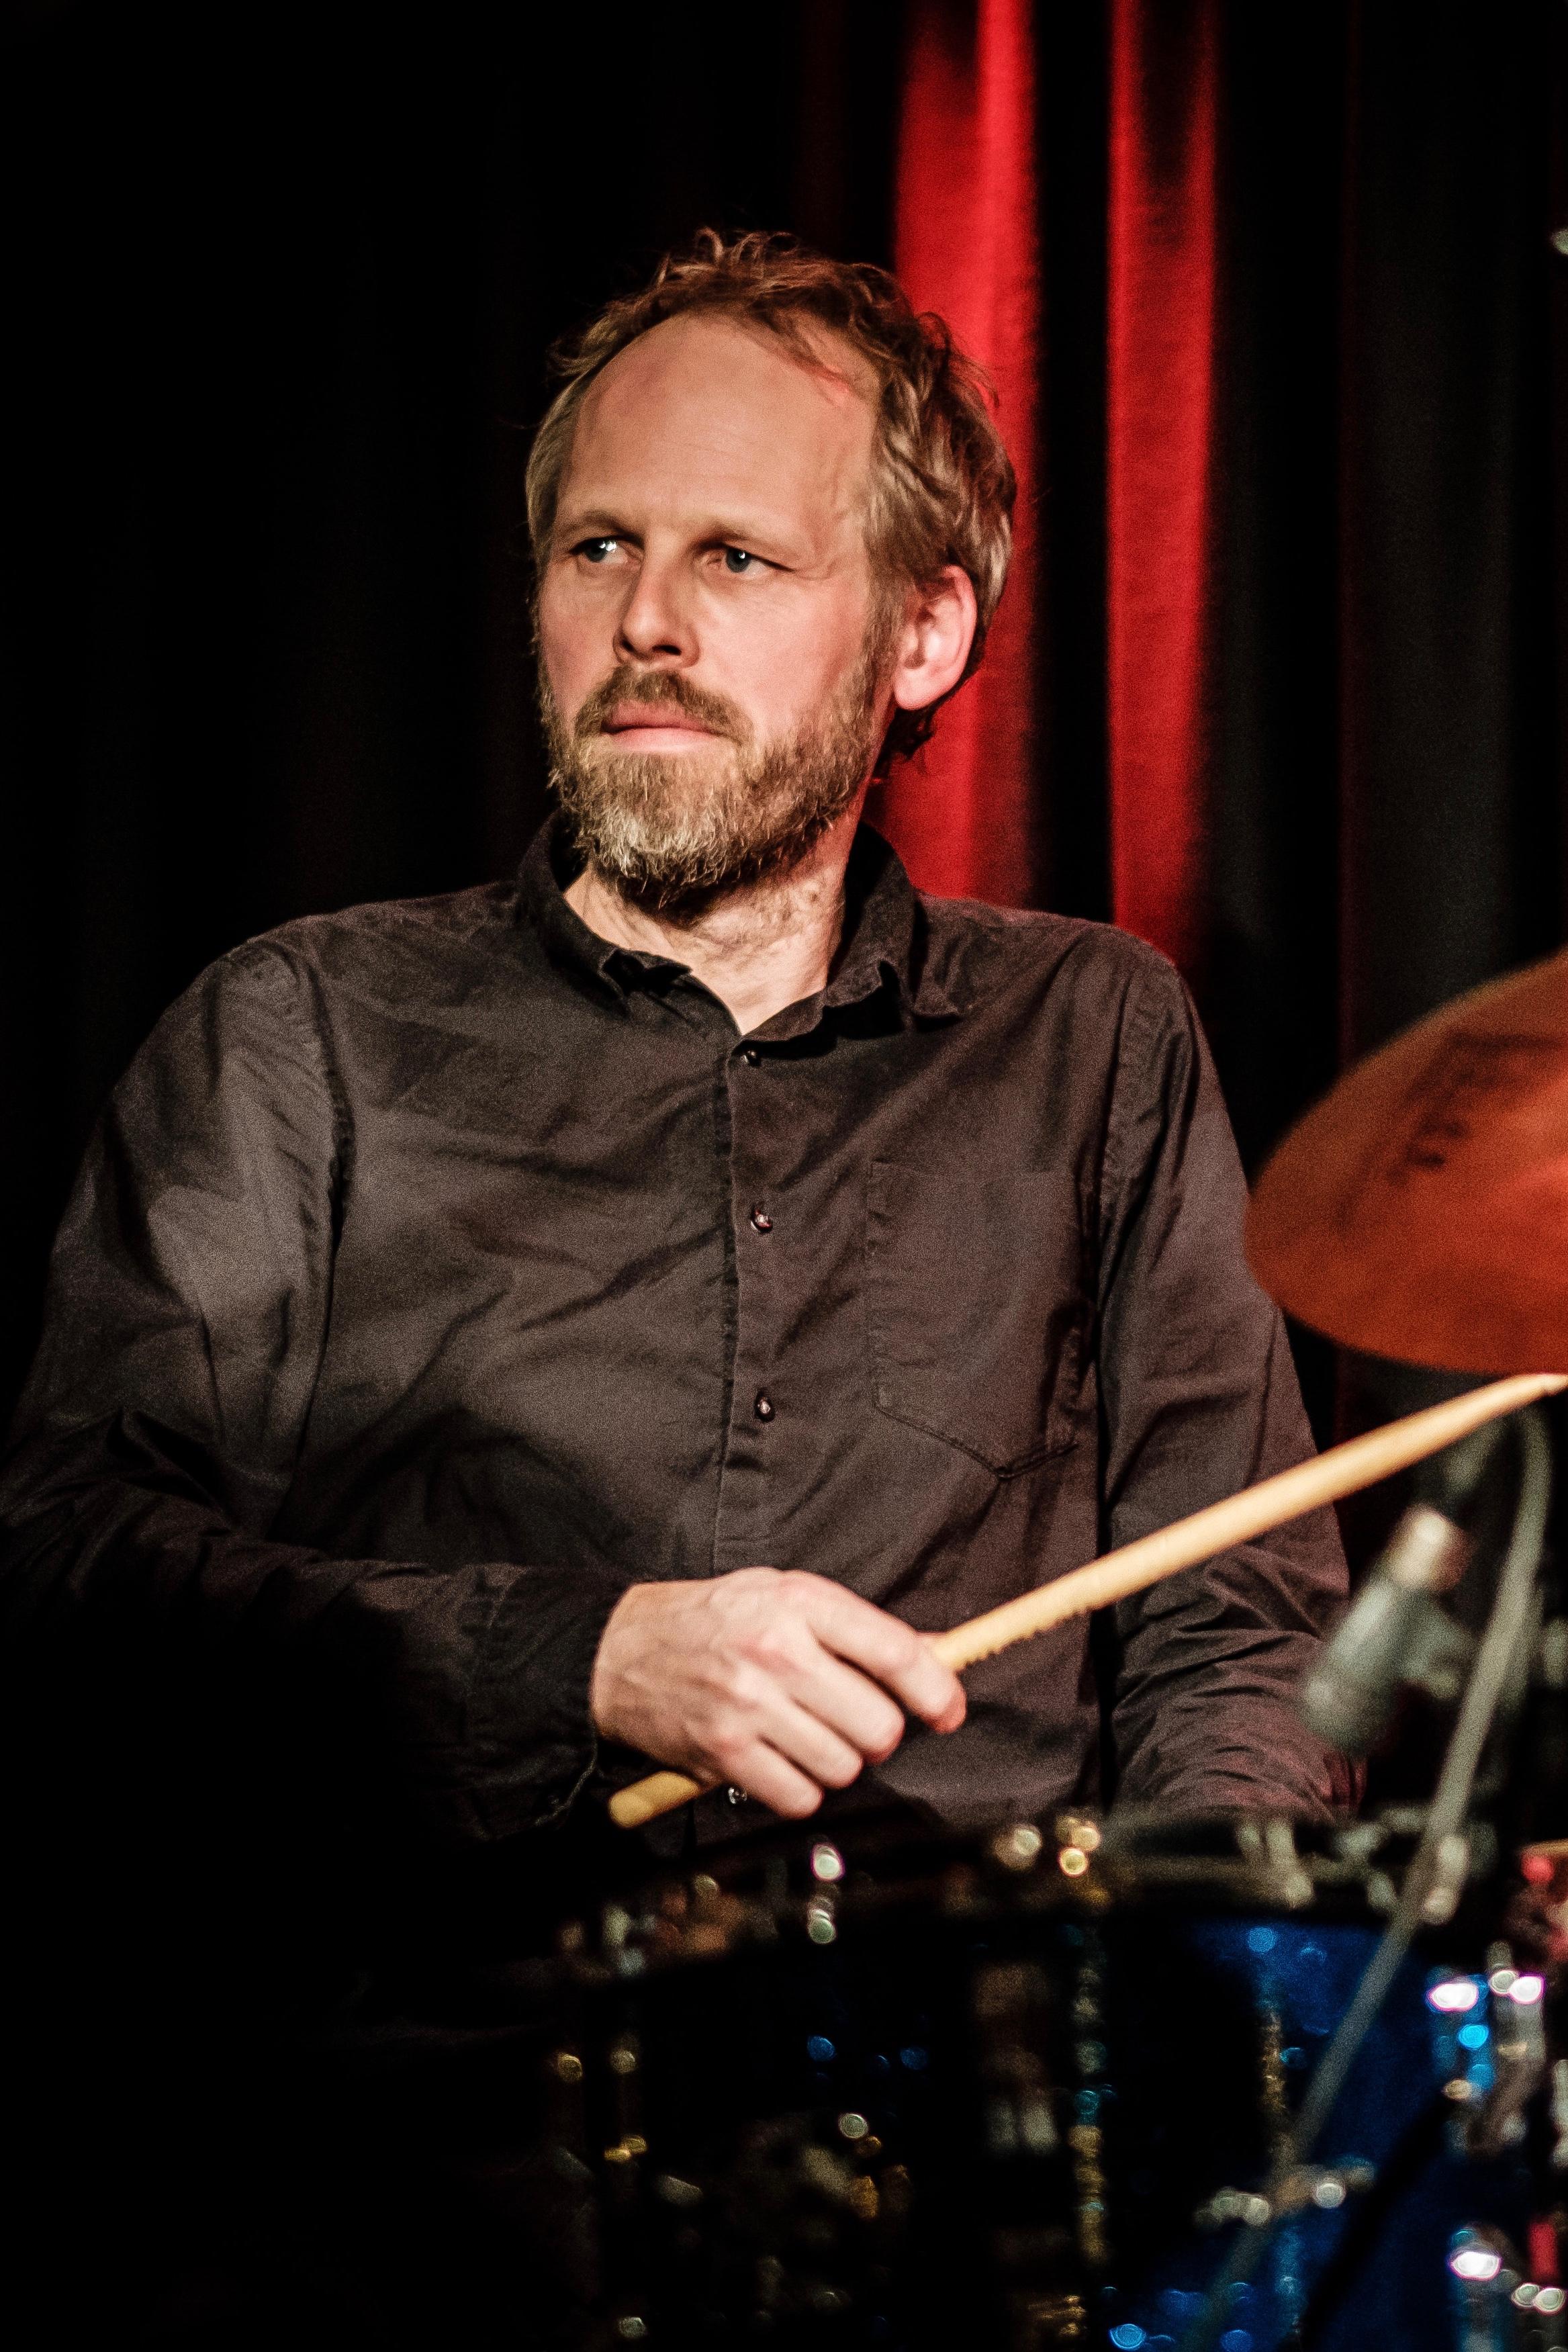 Peter Dombernowsky